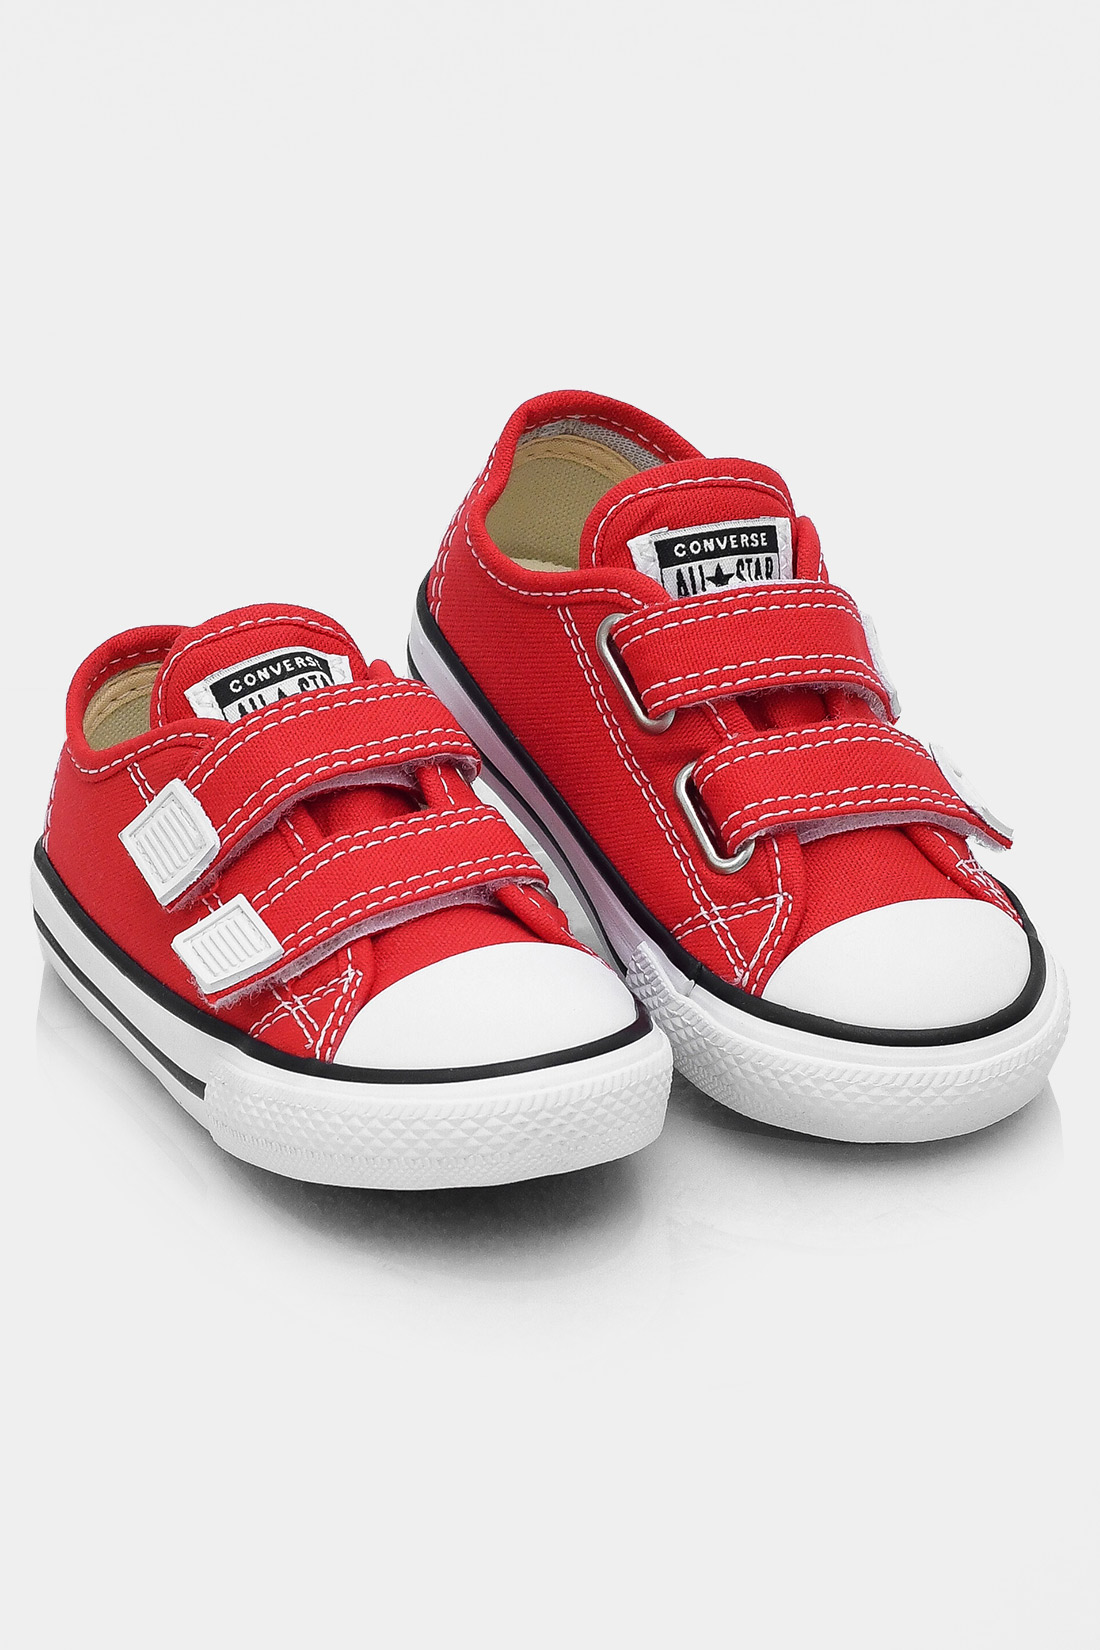 Tenis Casual Infantil All Star Chuck Taylor Velcro